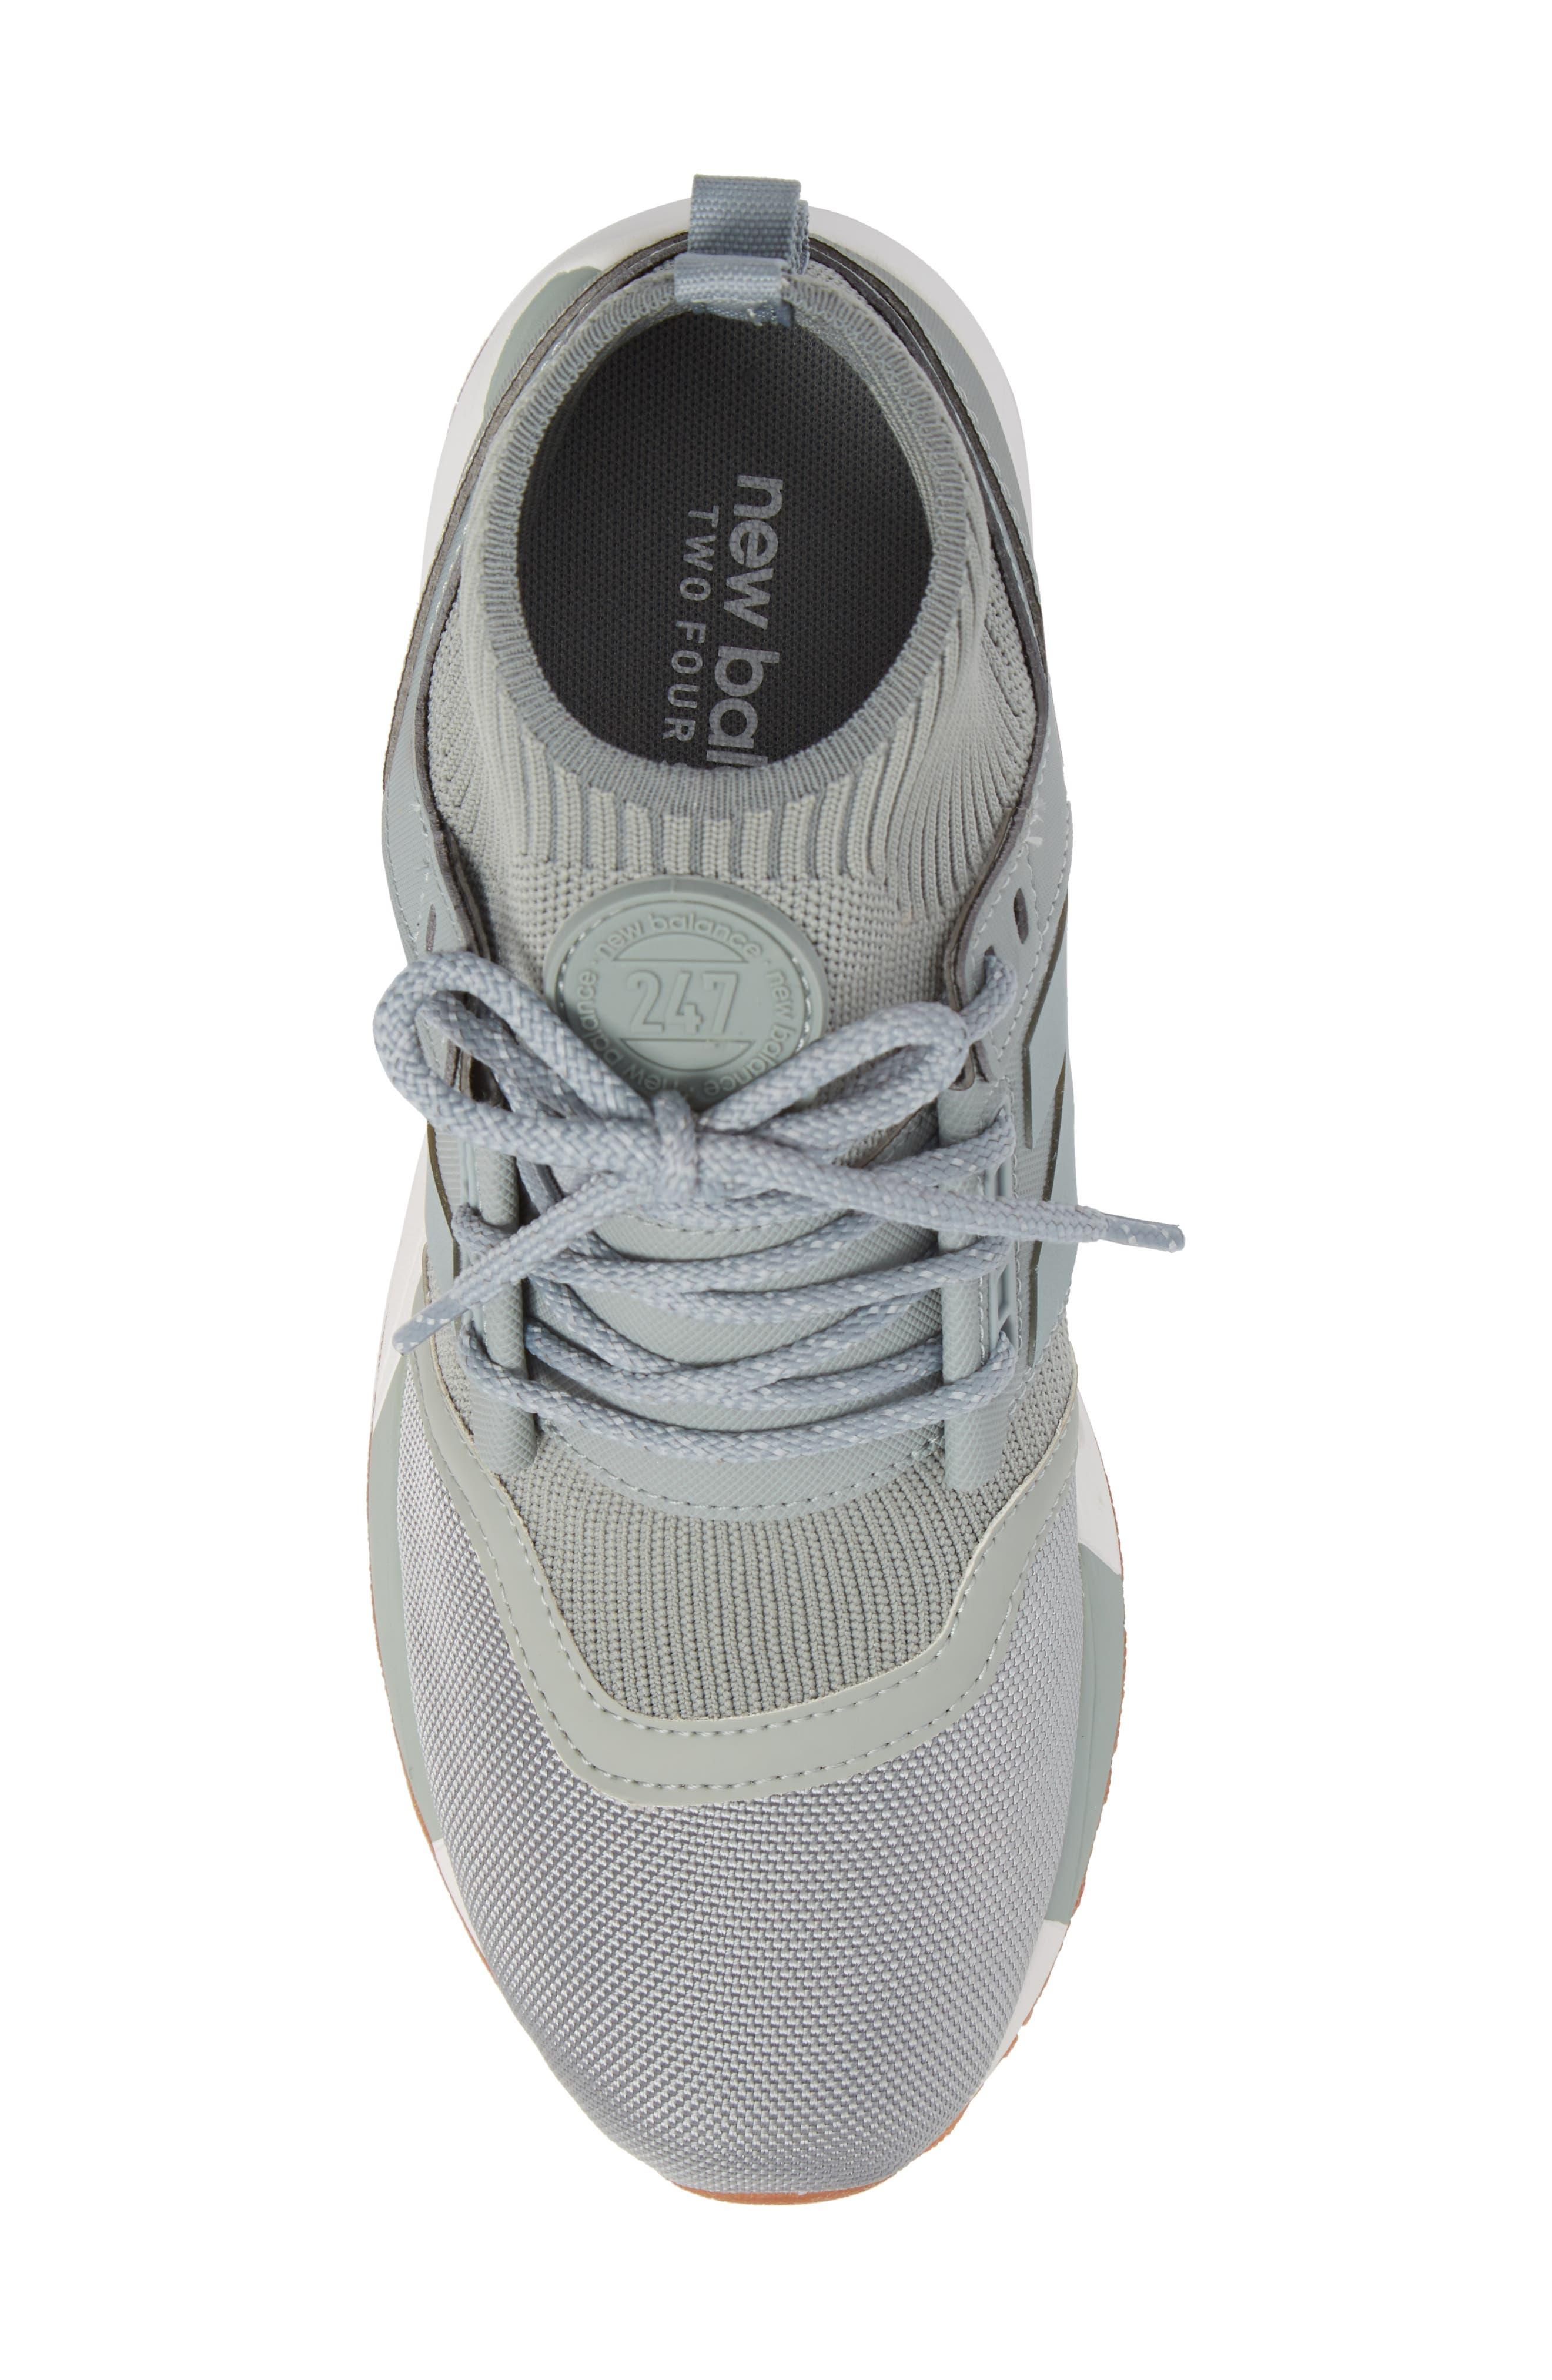 247 Mid Sneaker,                             Alternate thumbnail 18, color,